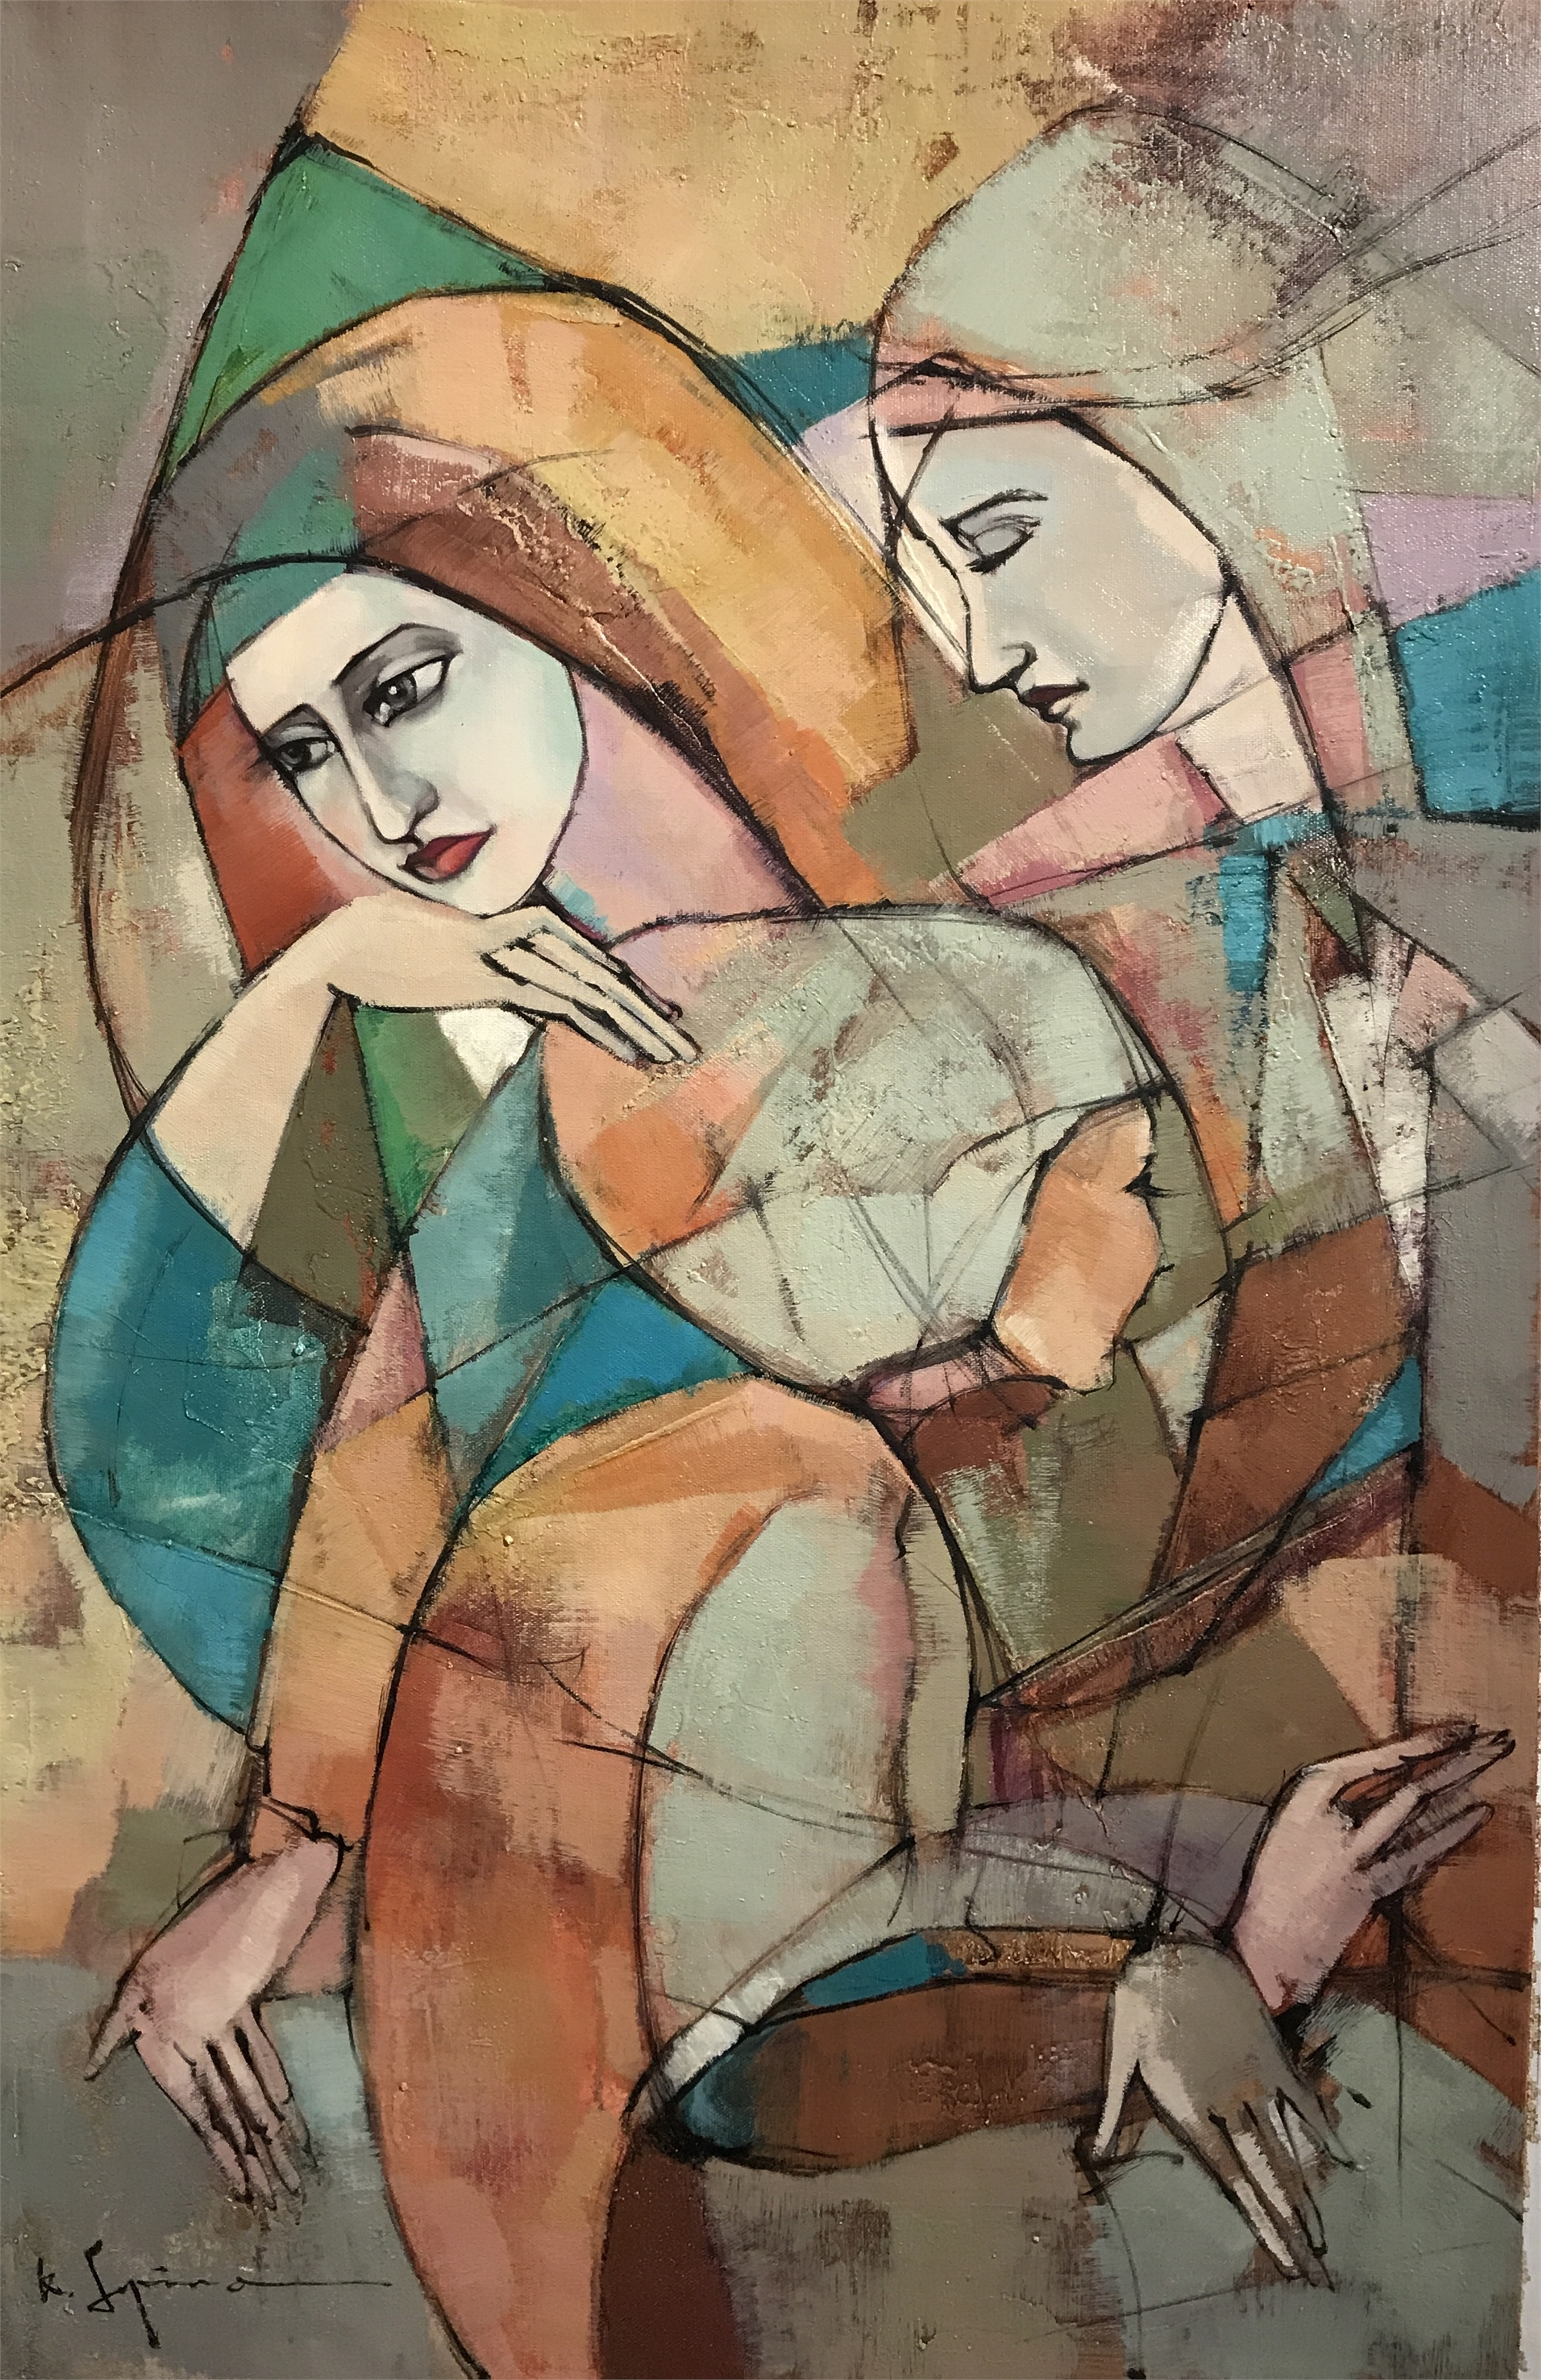 THREE LADIES by K. SOPINO